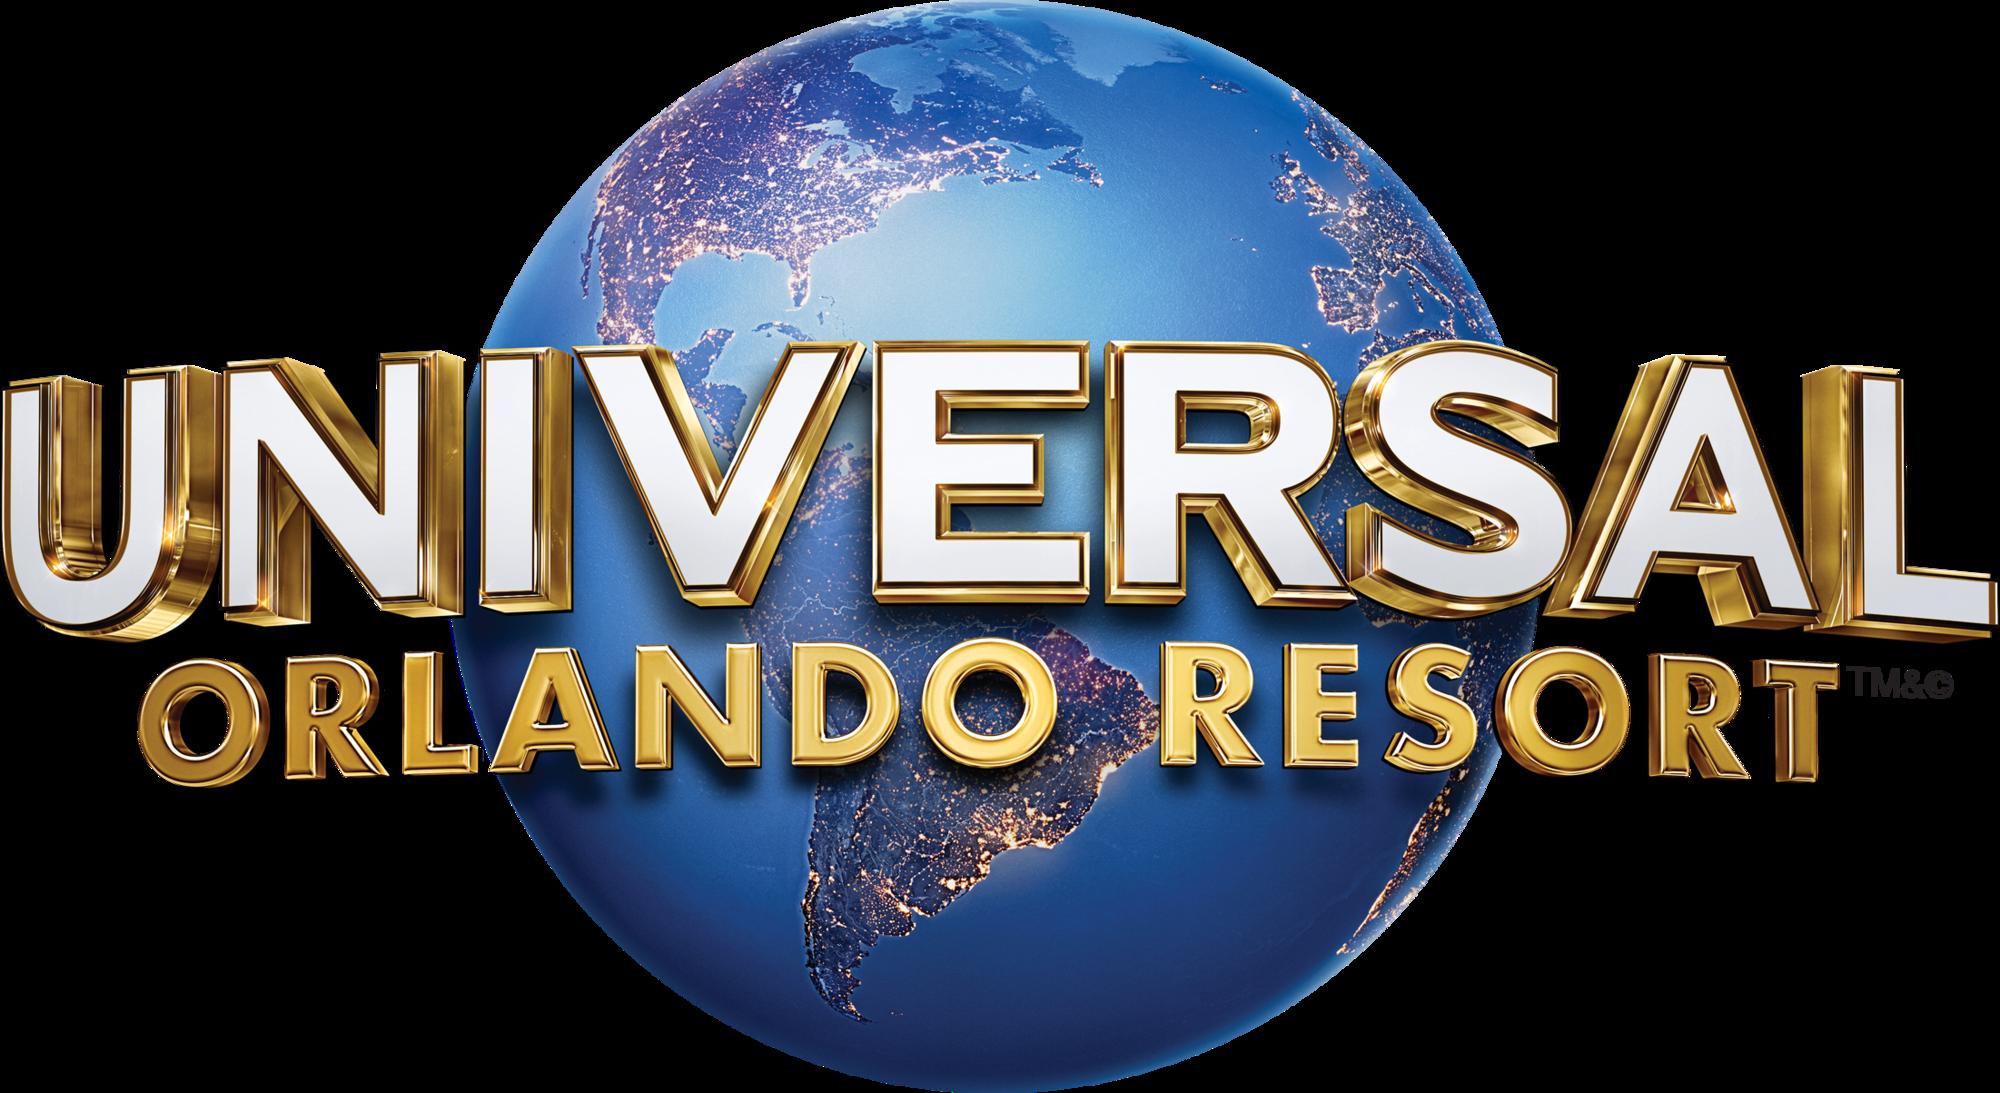 Orlando Universal Resort